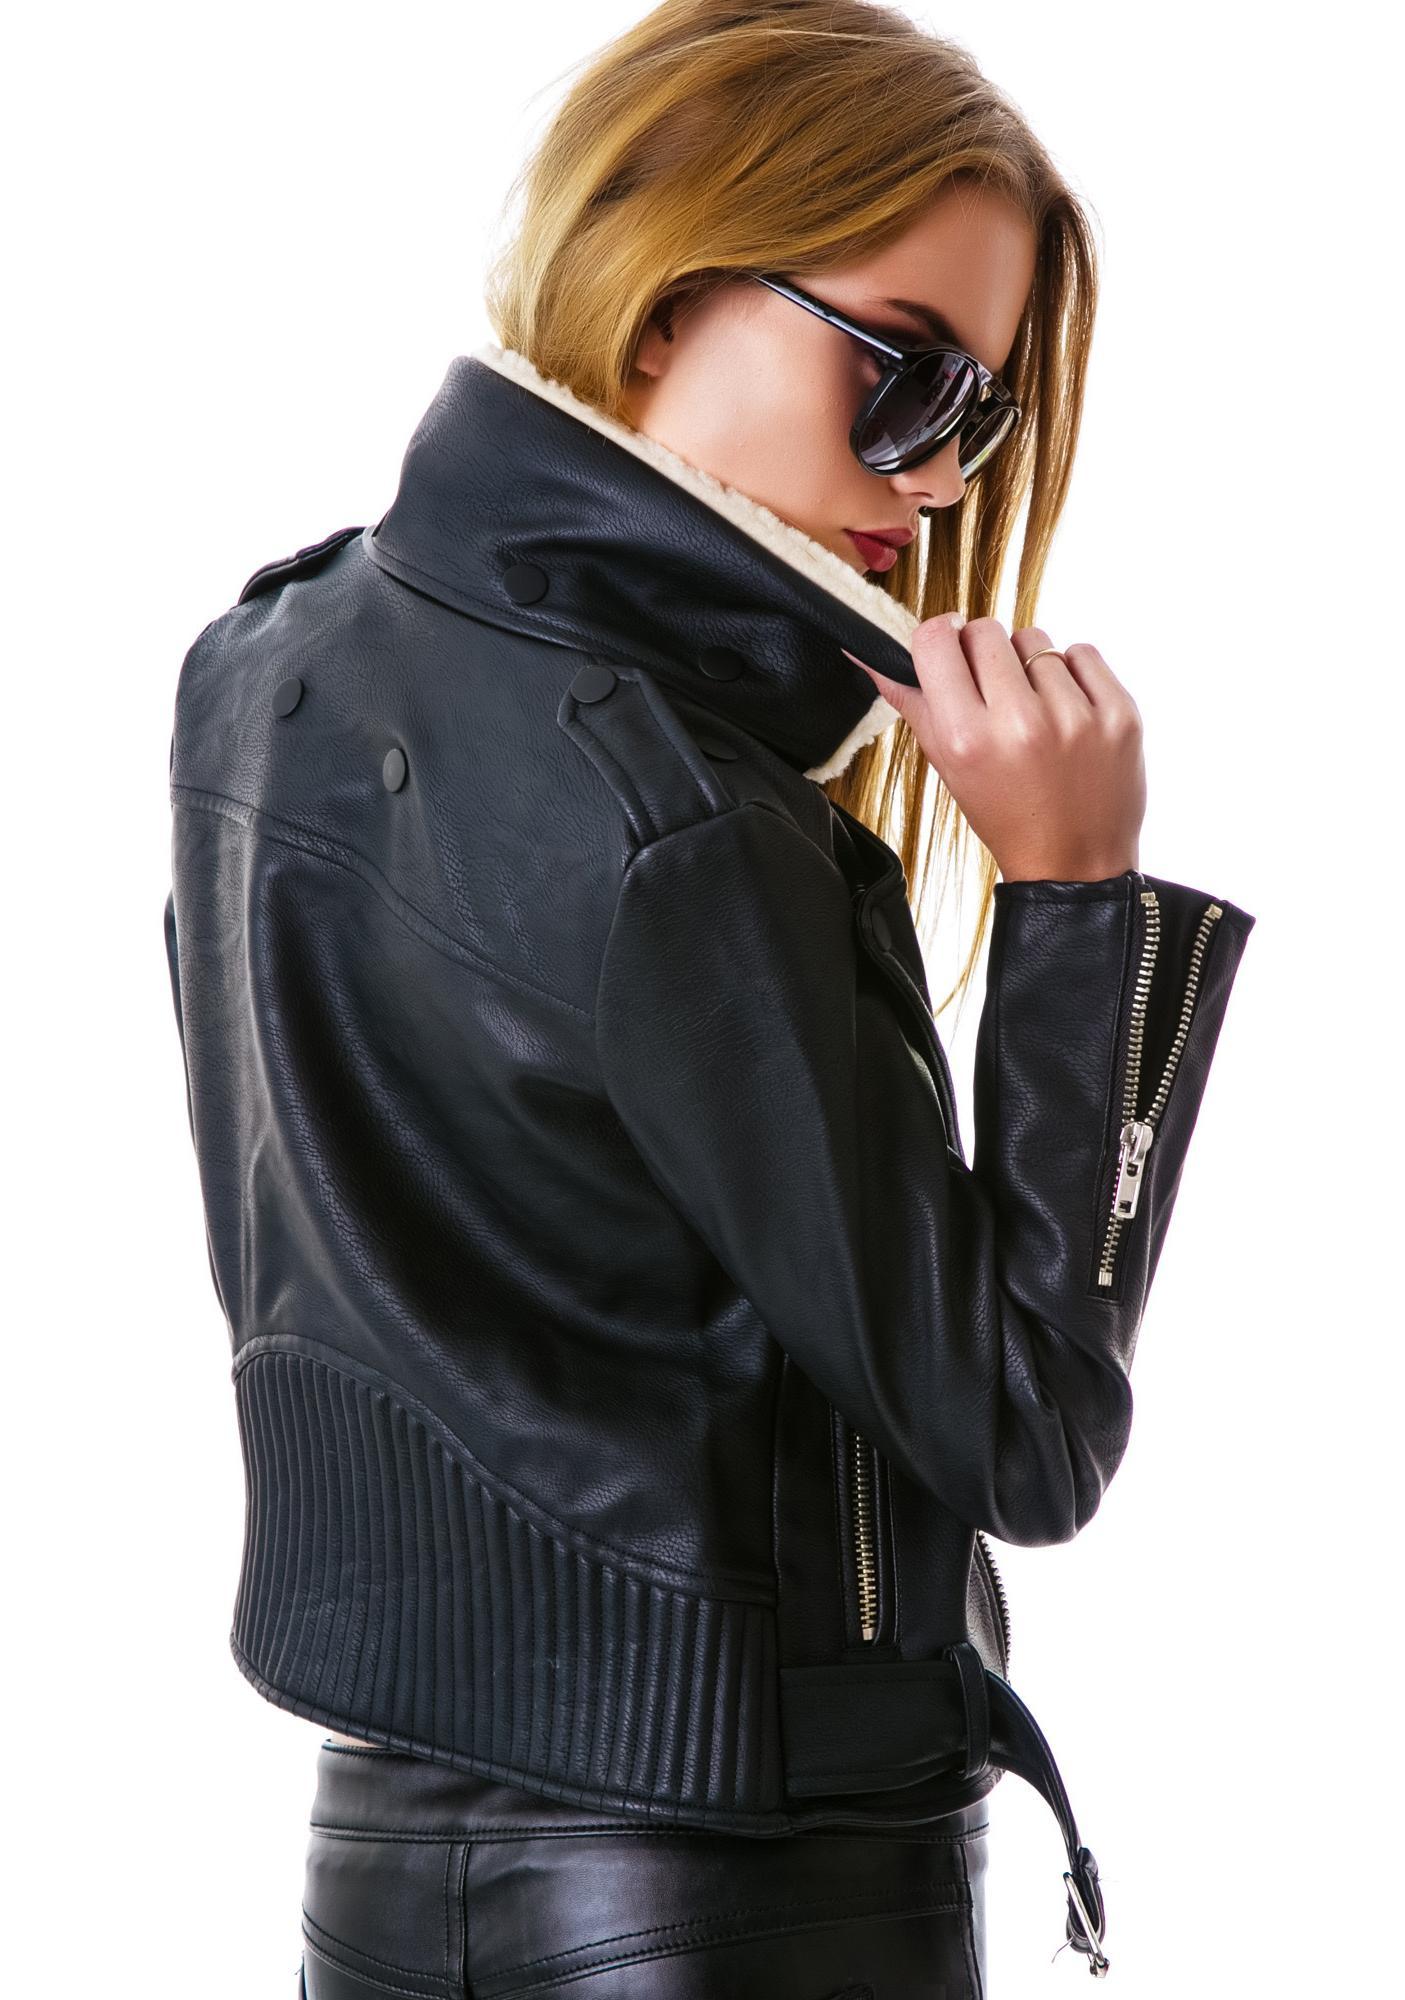 UNIF Avihater Jacket